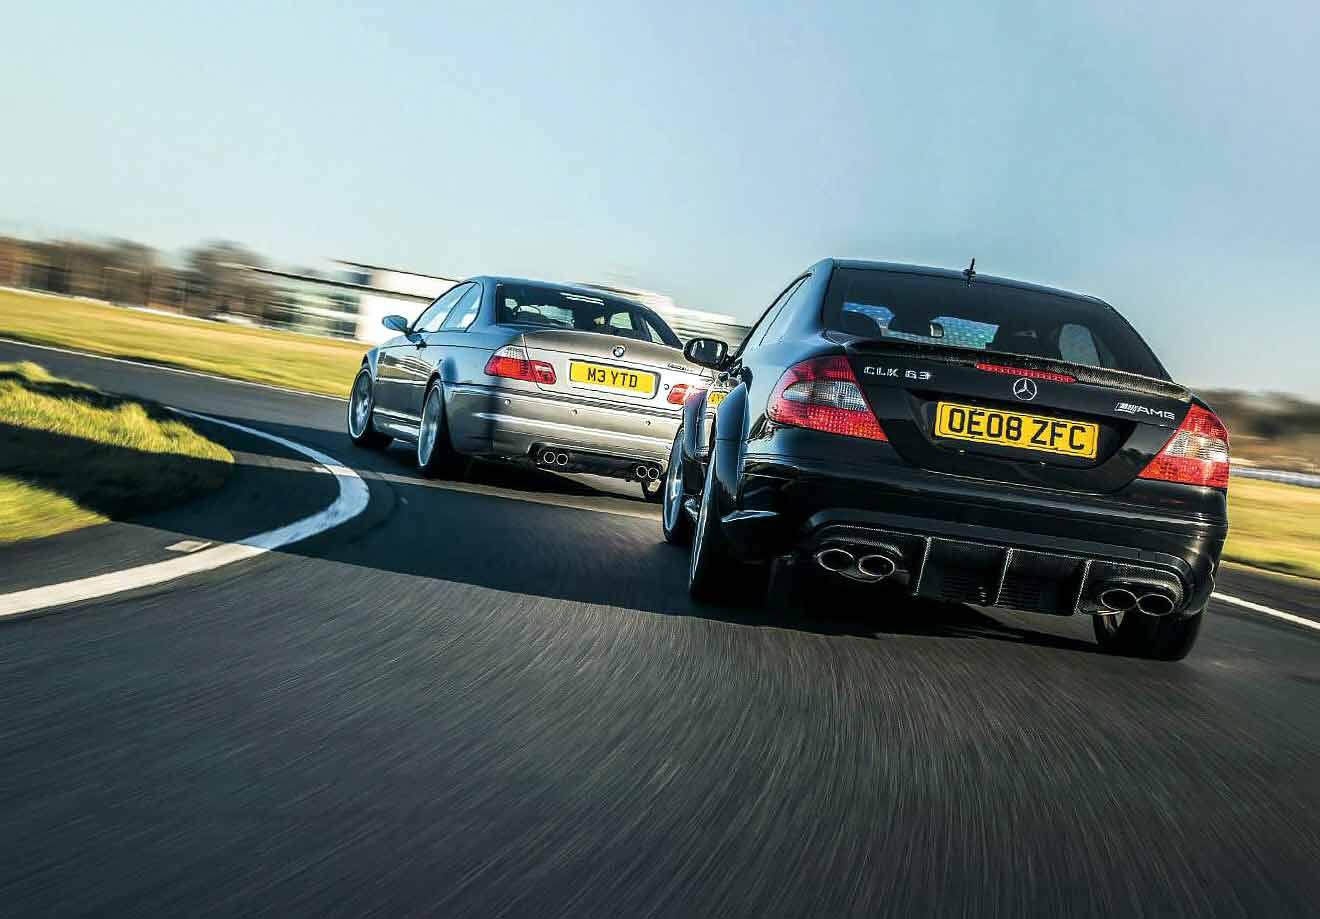 BMW M3 CSL E46 vs. Mercedes-Benz CLK63 AMG Black Series C209